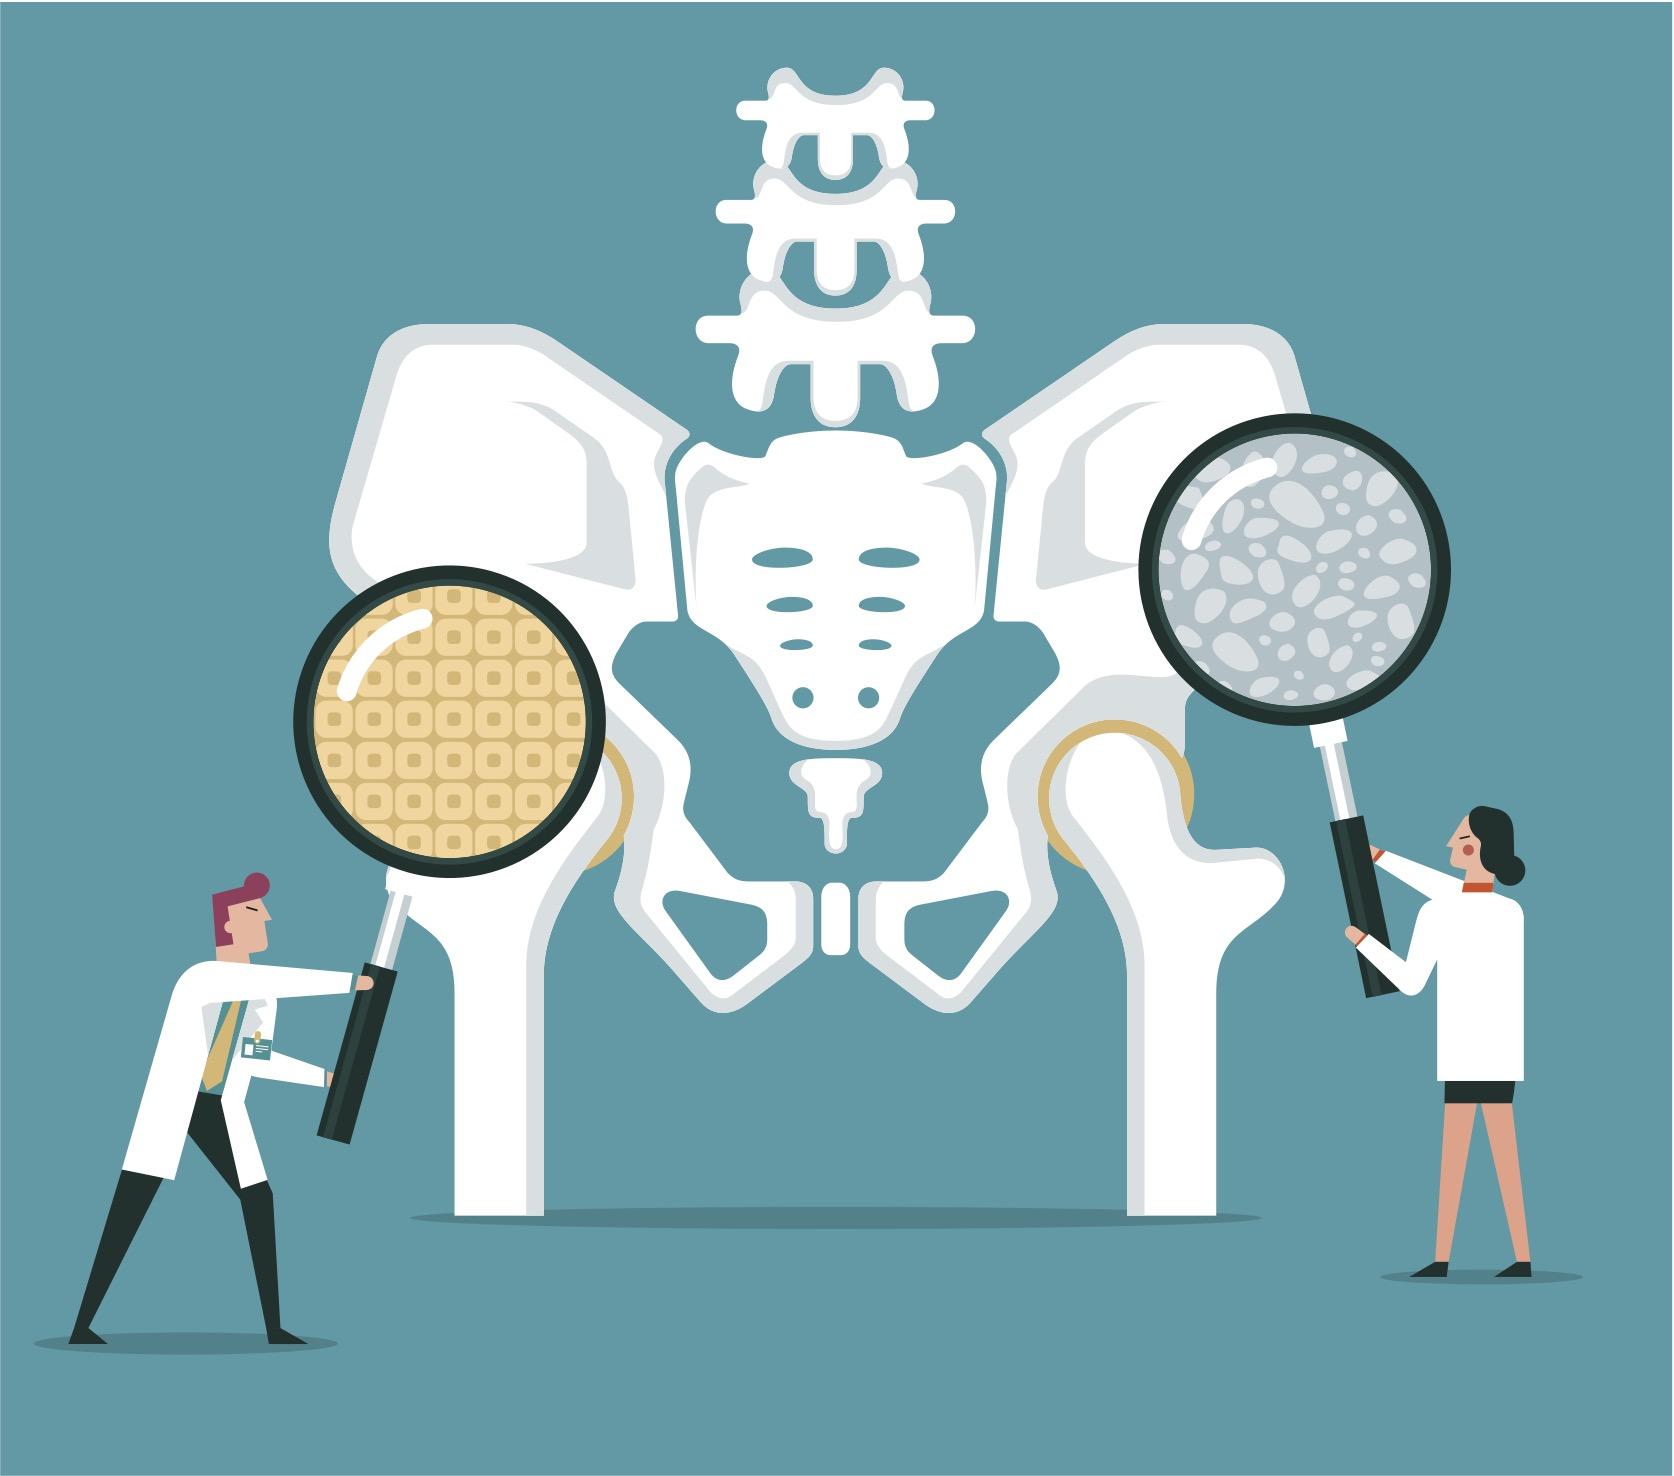 Huesos osteoporosis gente silver